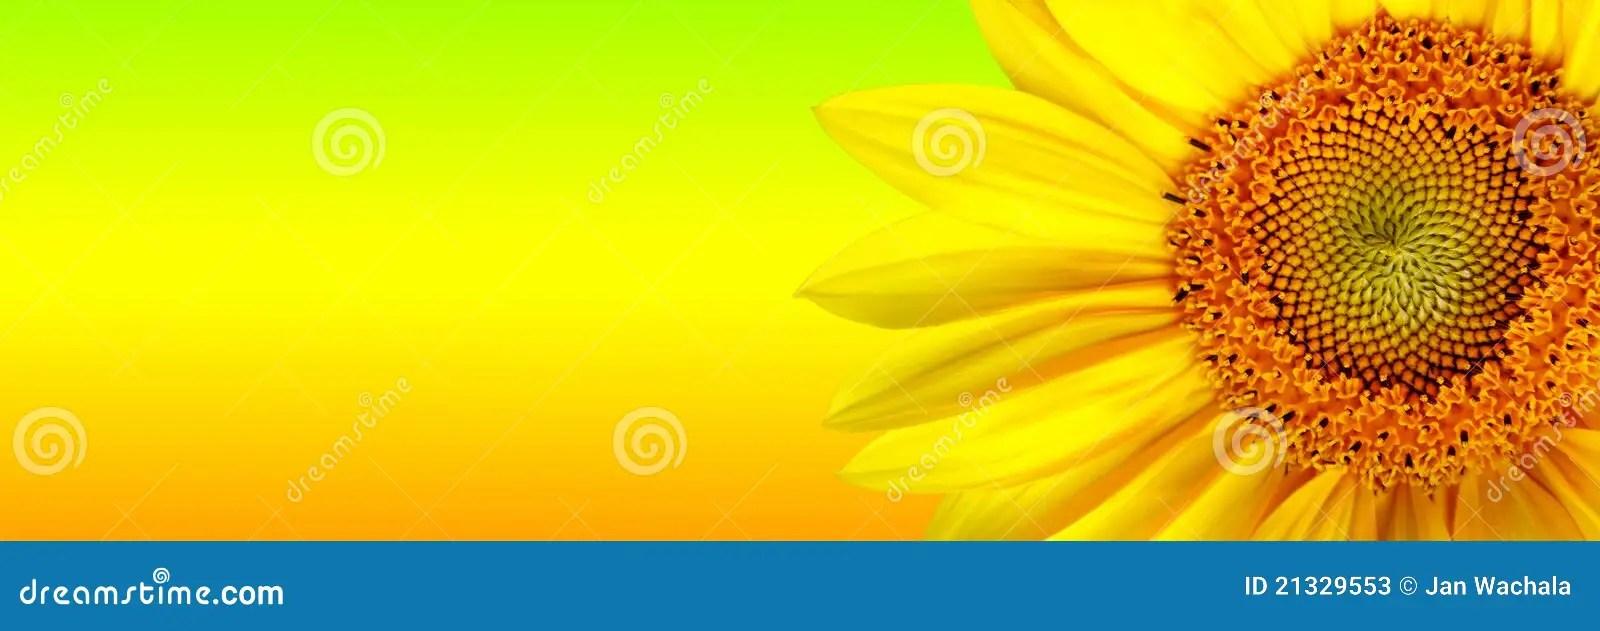 Fall Sunflowers Wallpaper Sunflower Banner Stock Photos Image 21329553